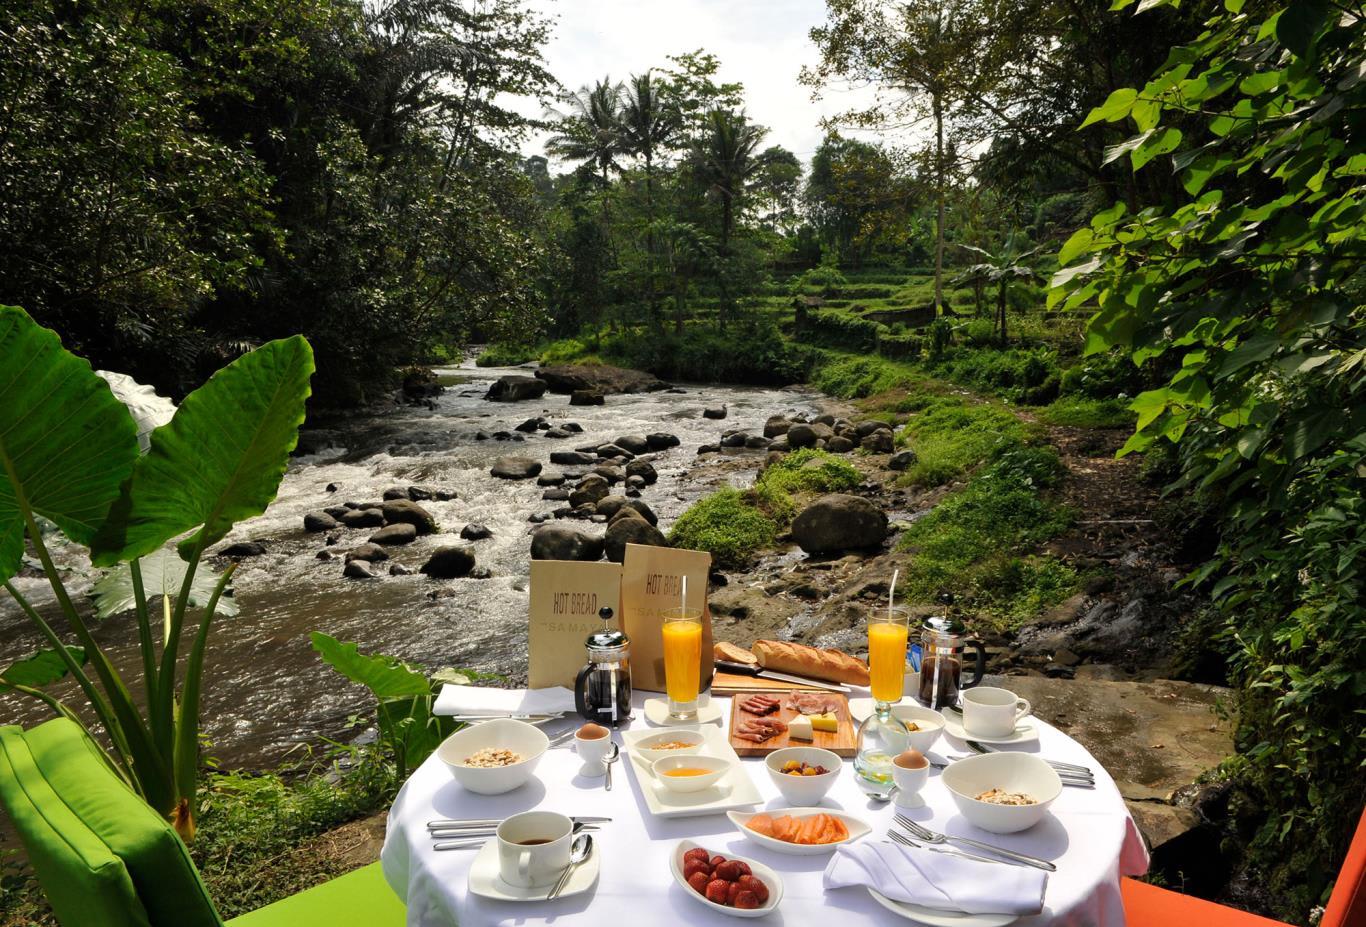 River view breakfast